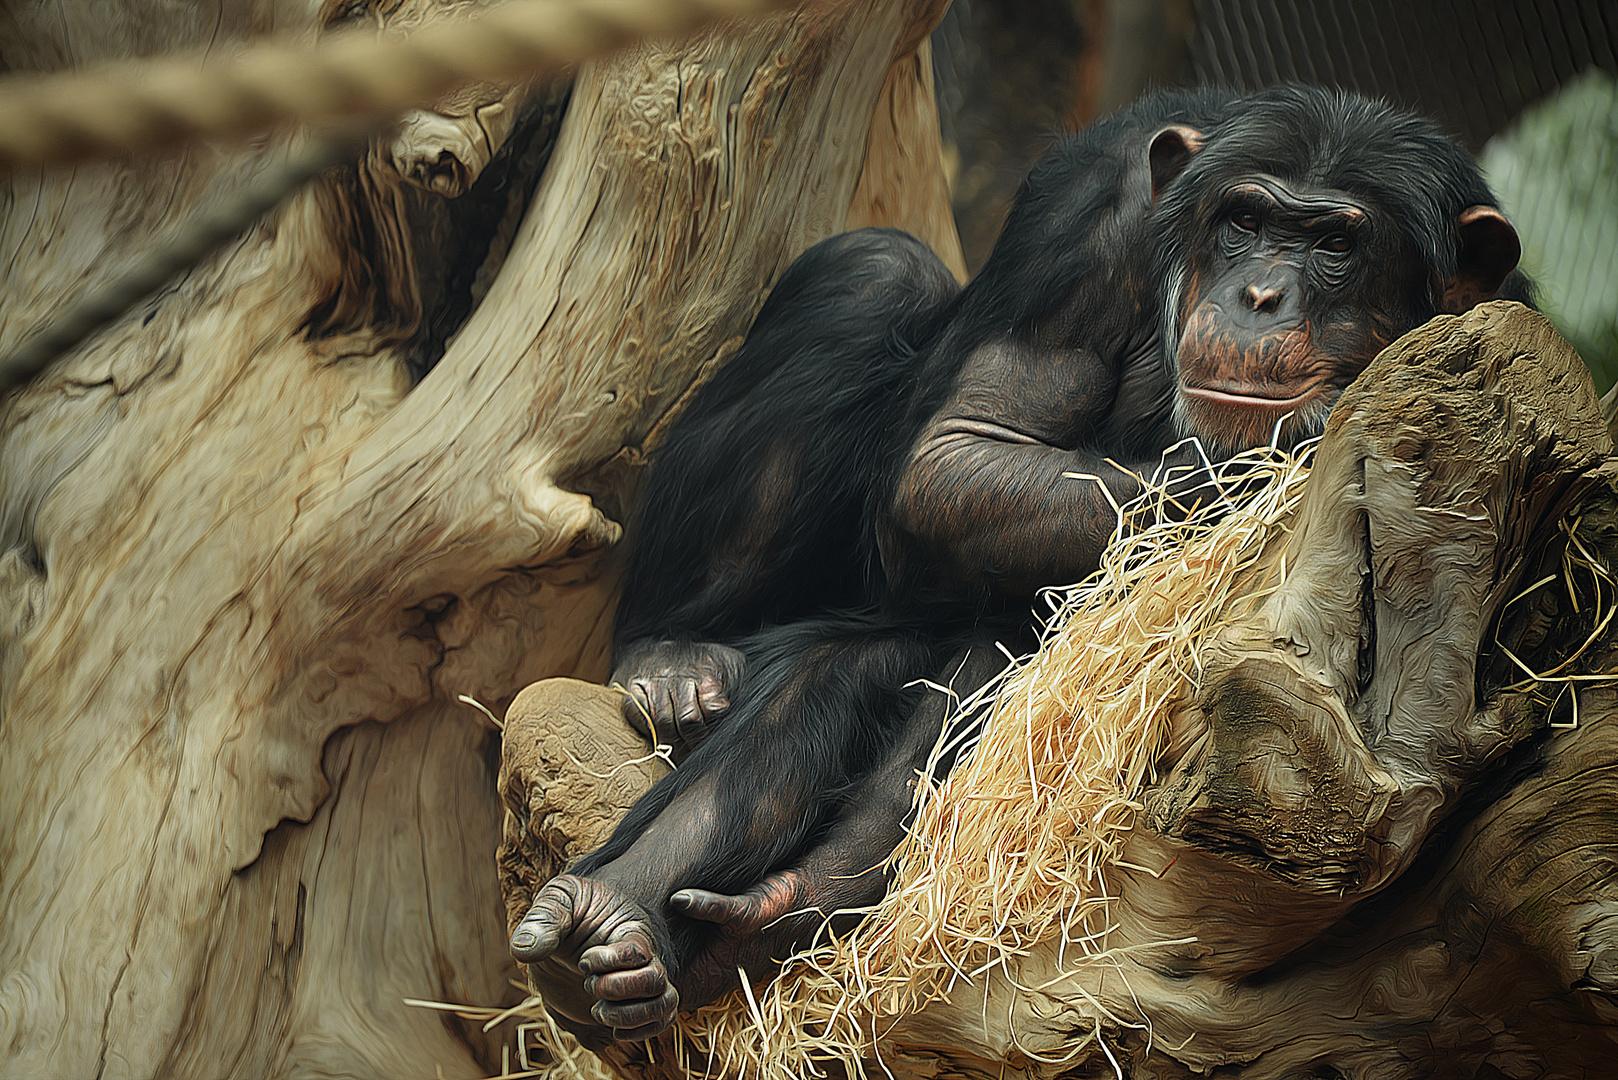 Its just a monkey